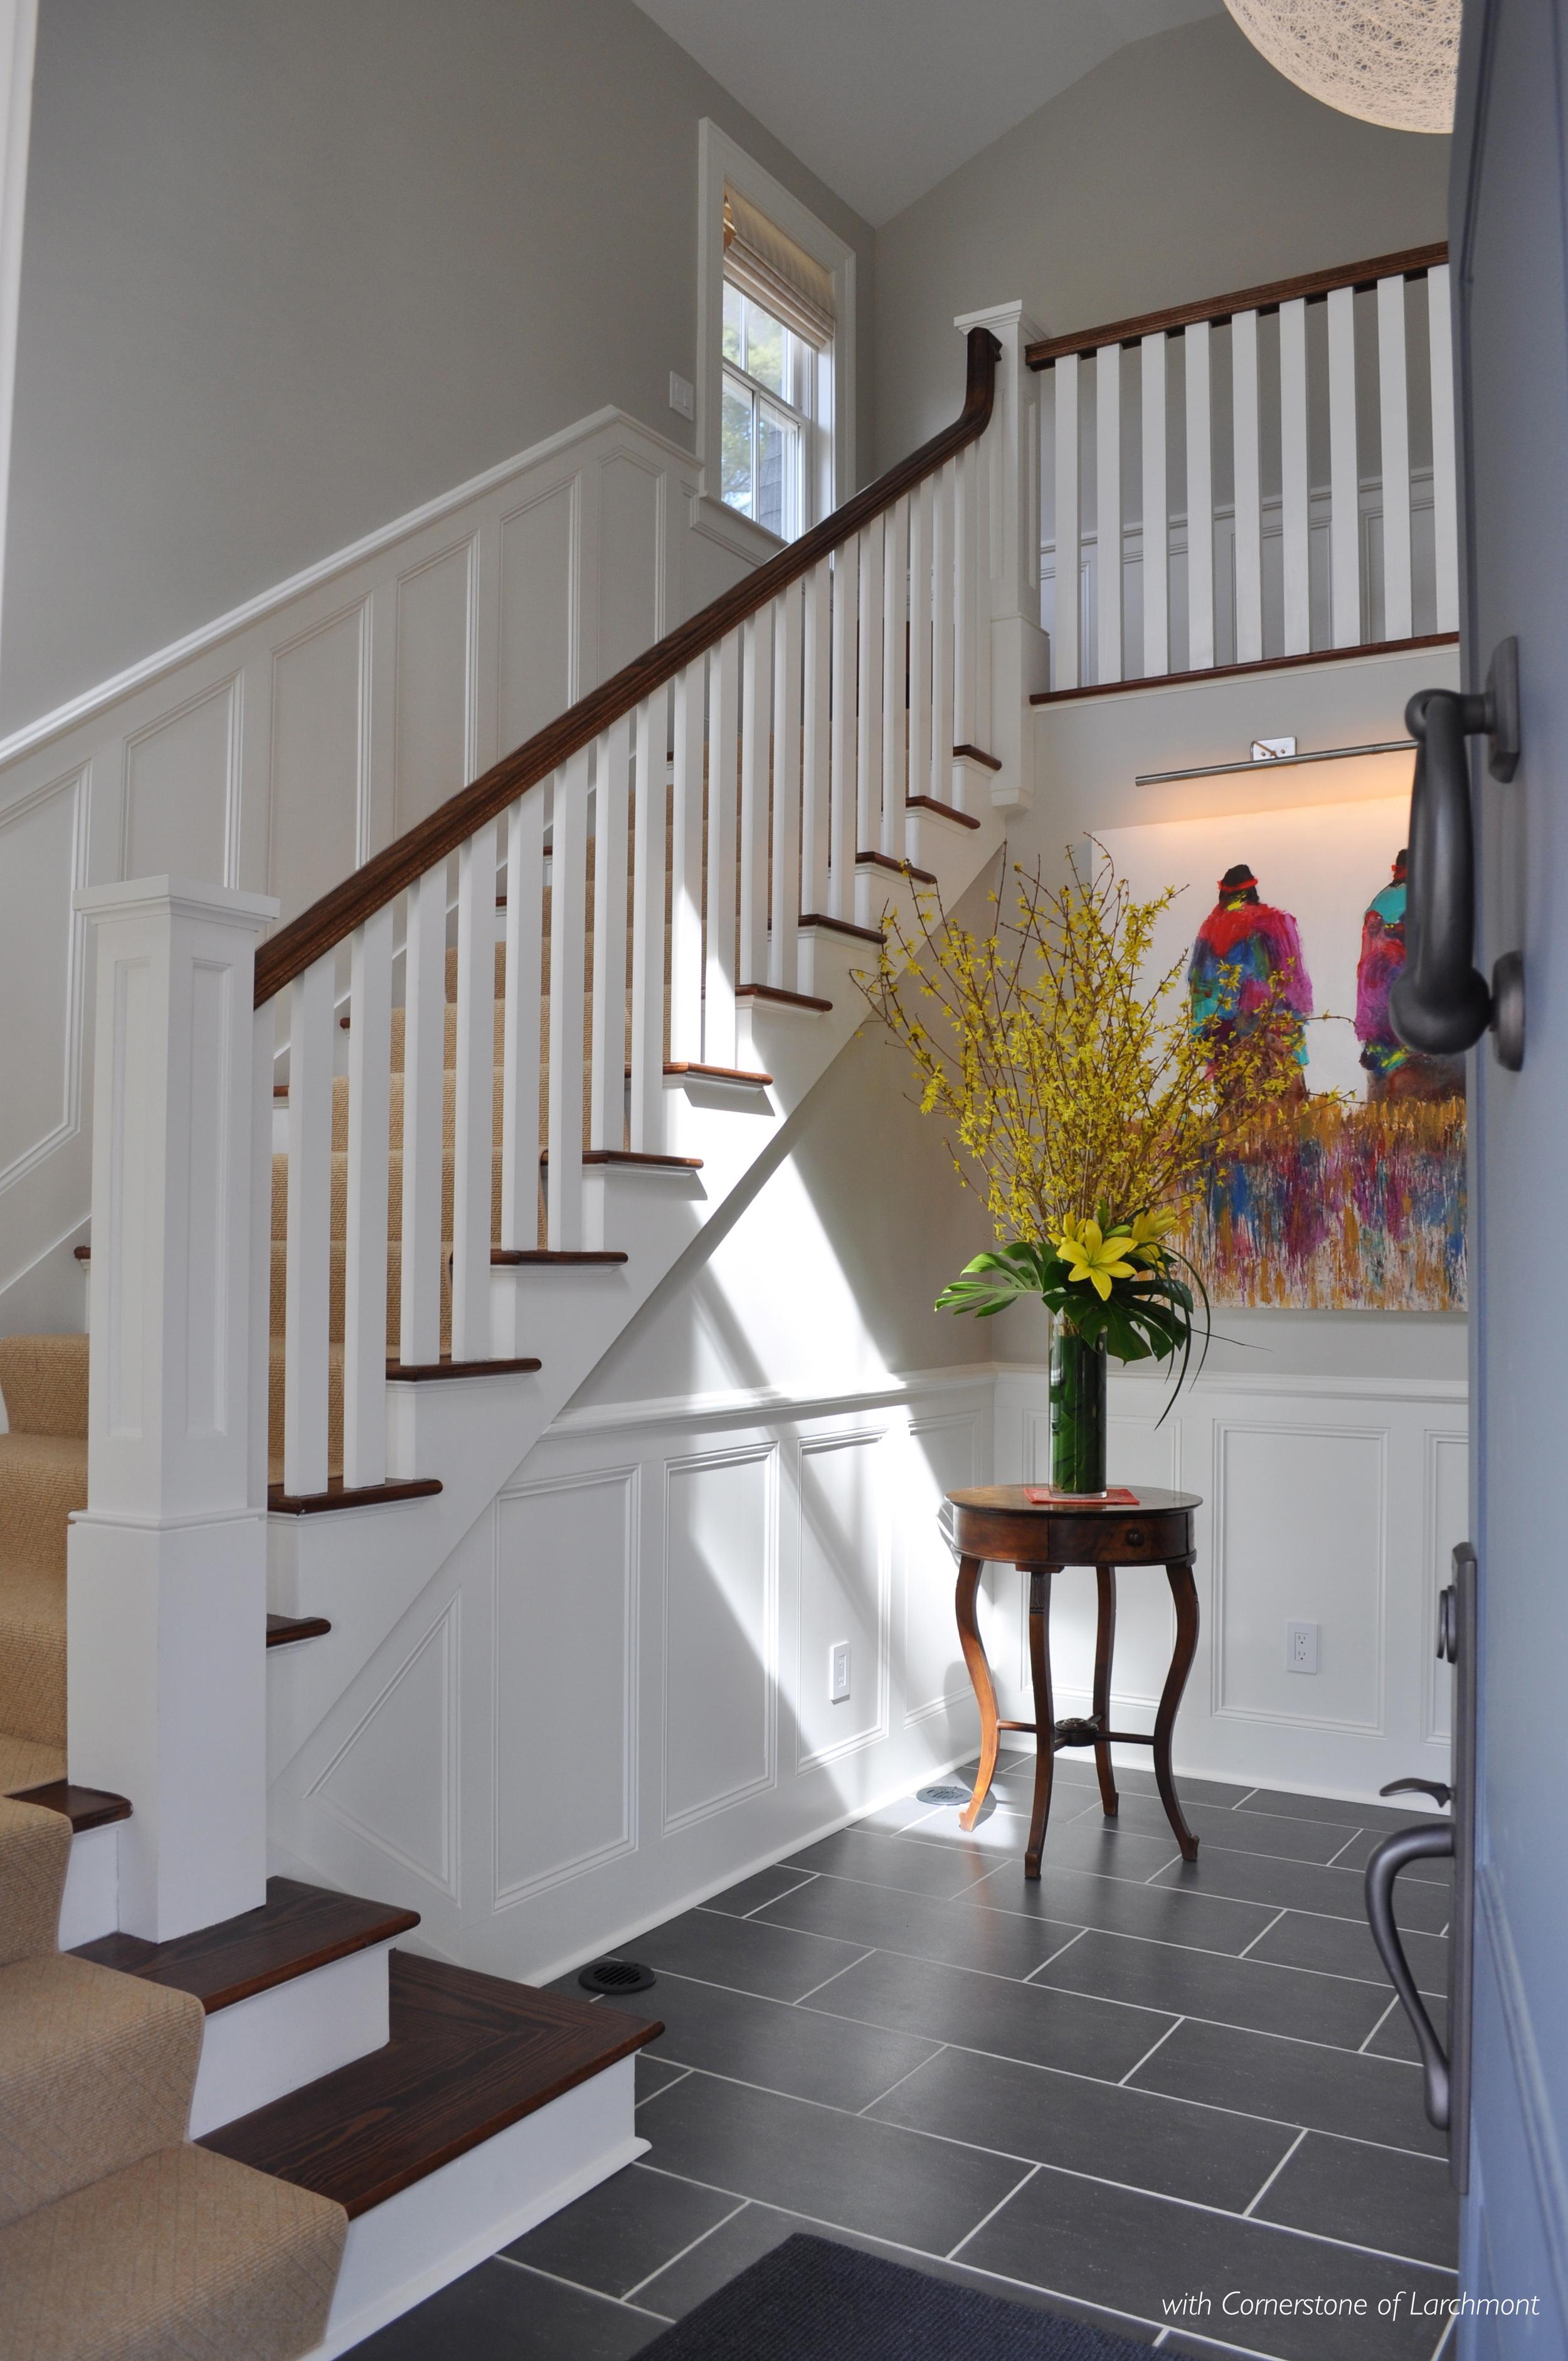 Home Remodel_Front Entry Door_Foyer_Porcelain Floor Tile_Gray Walls_Blue Front Door_Picture Lights_Westchester NY_KAM DESIGN LLC.jpg